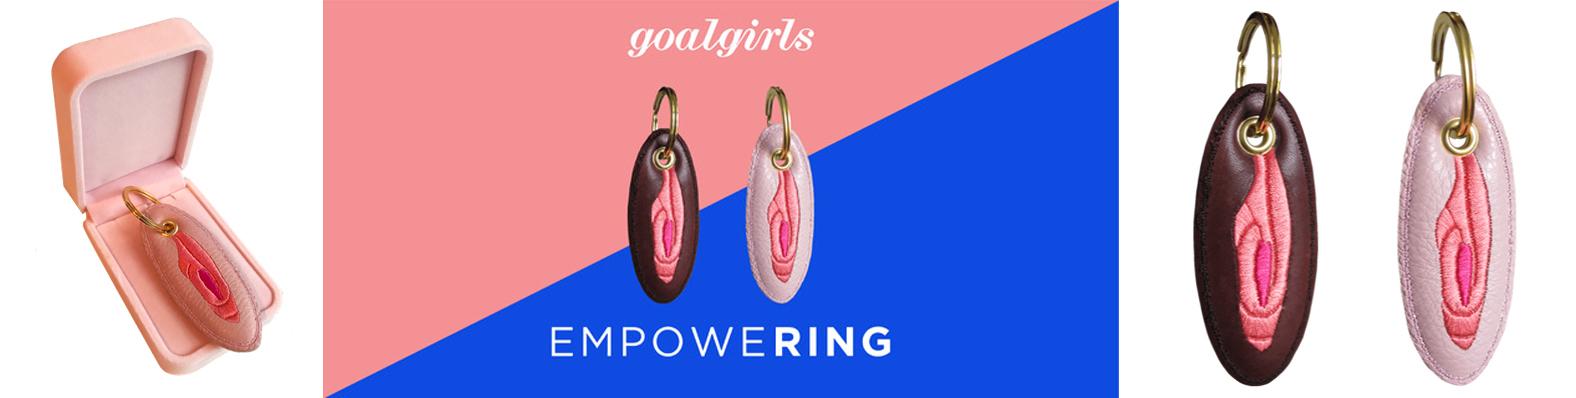 goalgirls-vulva-anhaenger